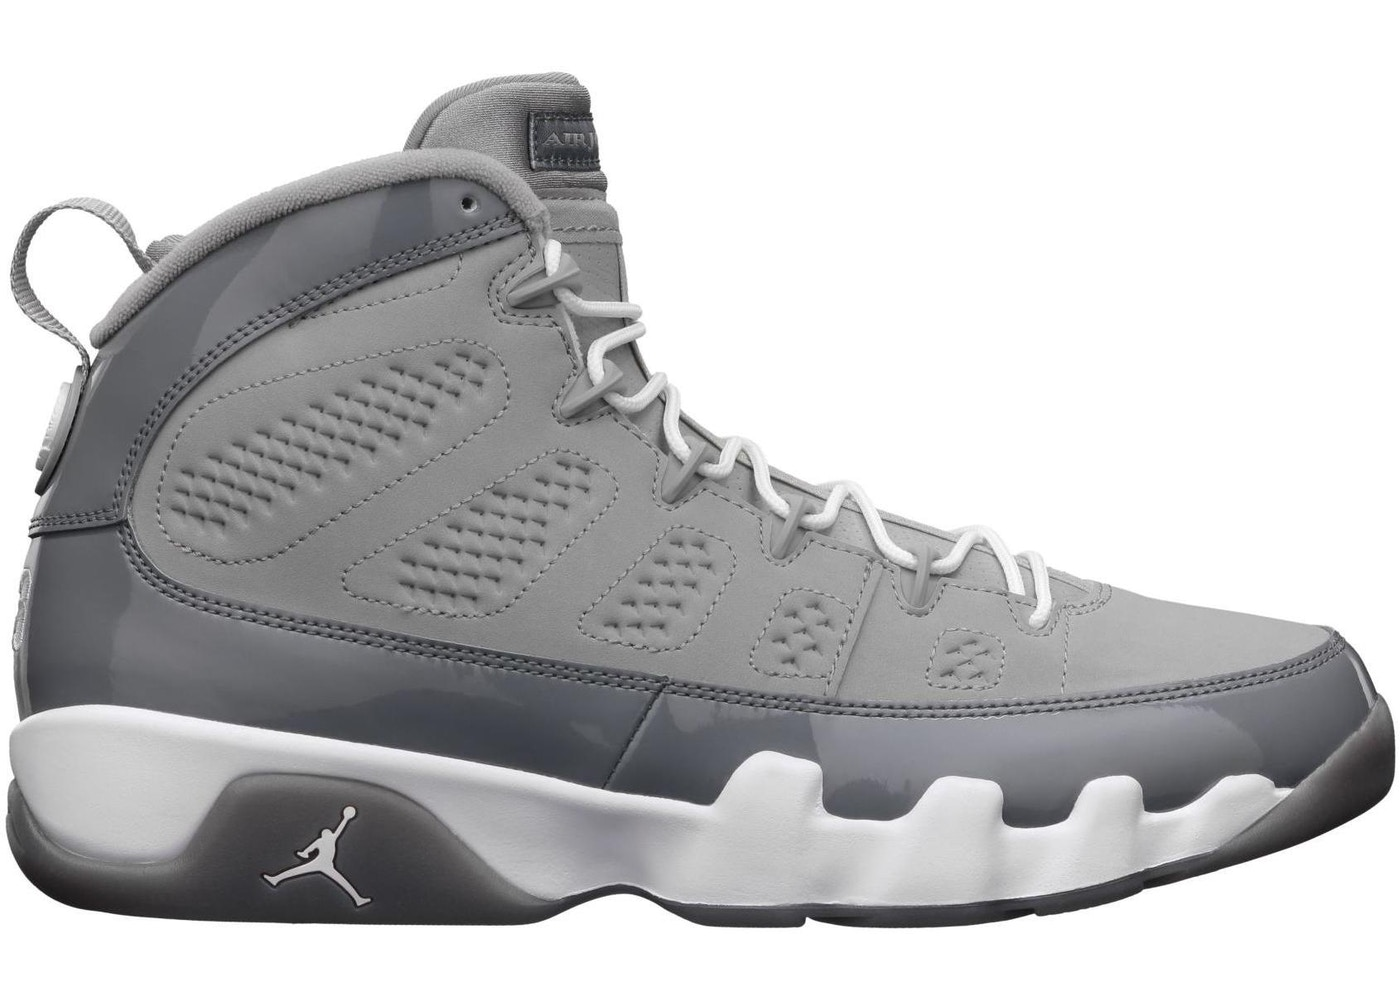 cheap for discount b200e 96c47 Buy Air Jordan 9 Shoes   Deadstock Sneakers